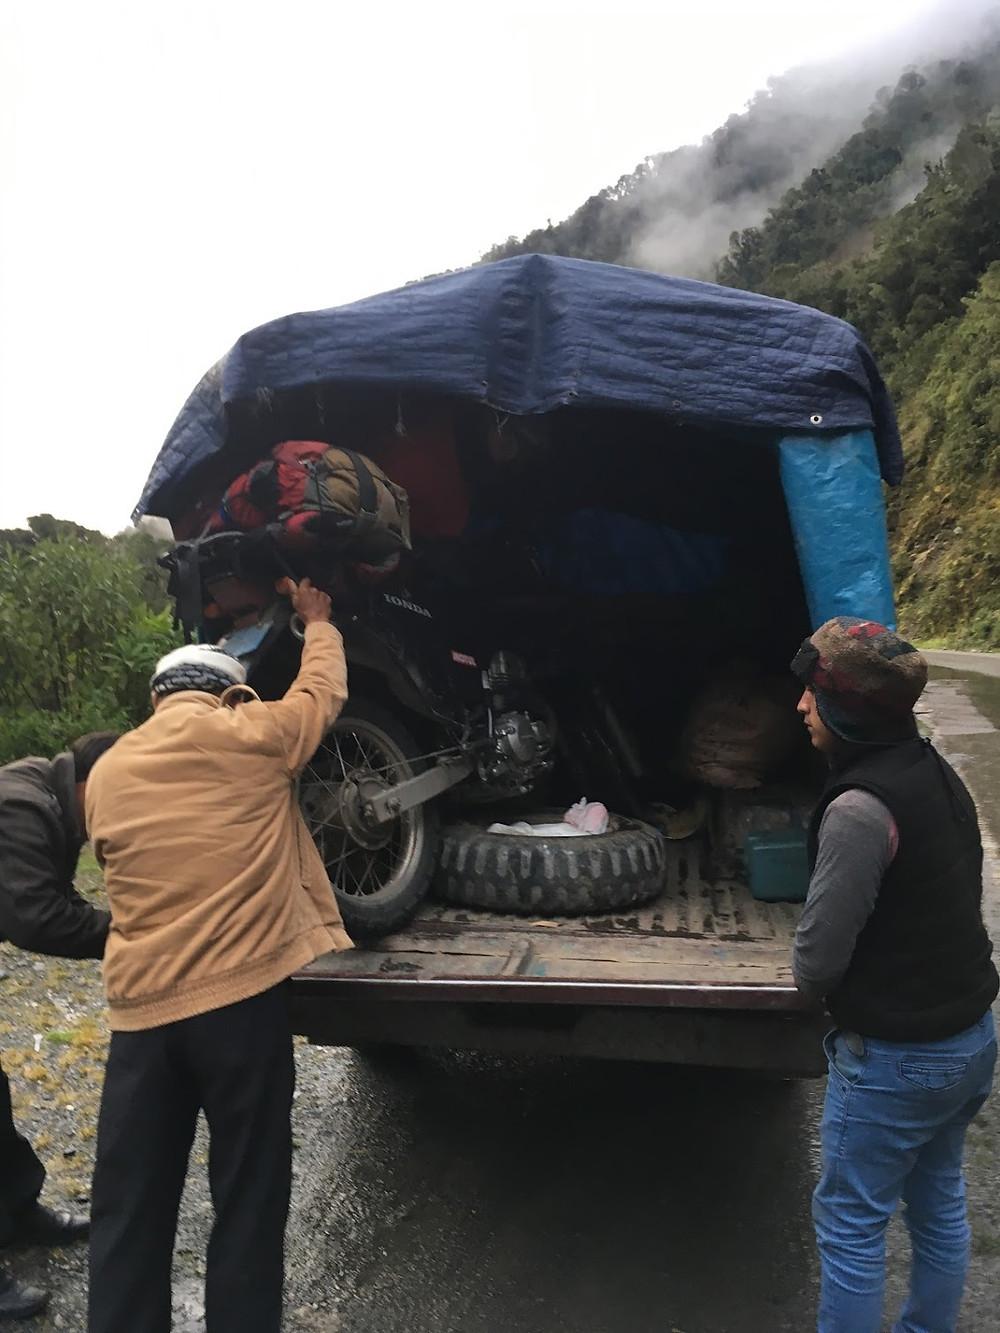 Peruvian men helping lift a motorcycle into a car.